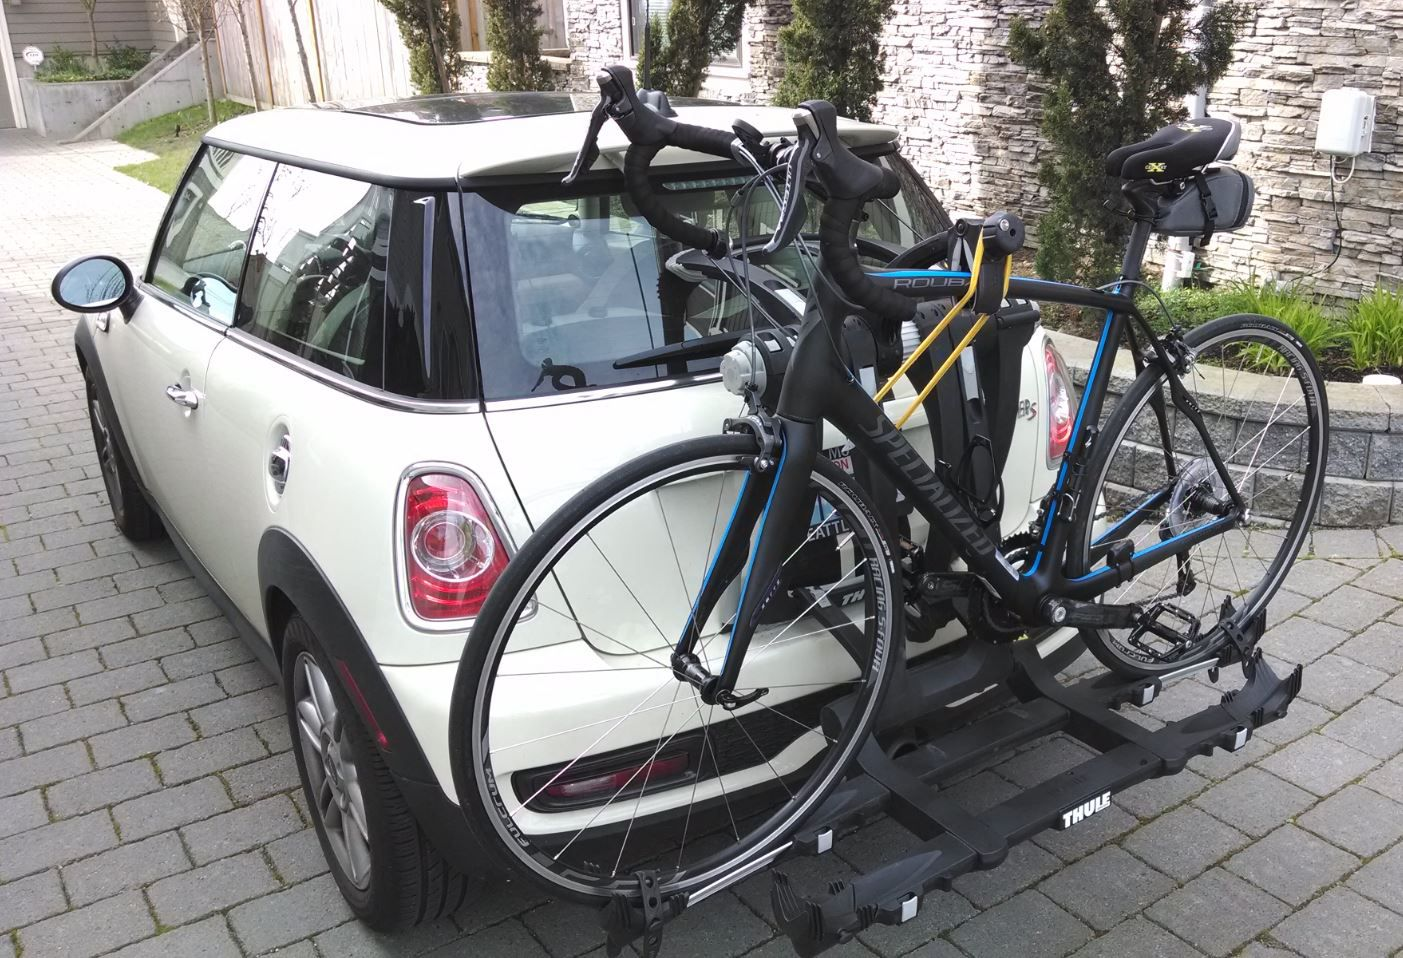 Mini Cooper S Bike Rack For A Specialized Roubaix Car